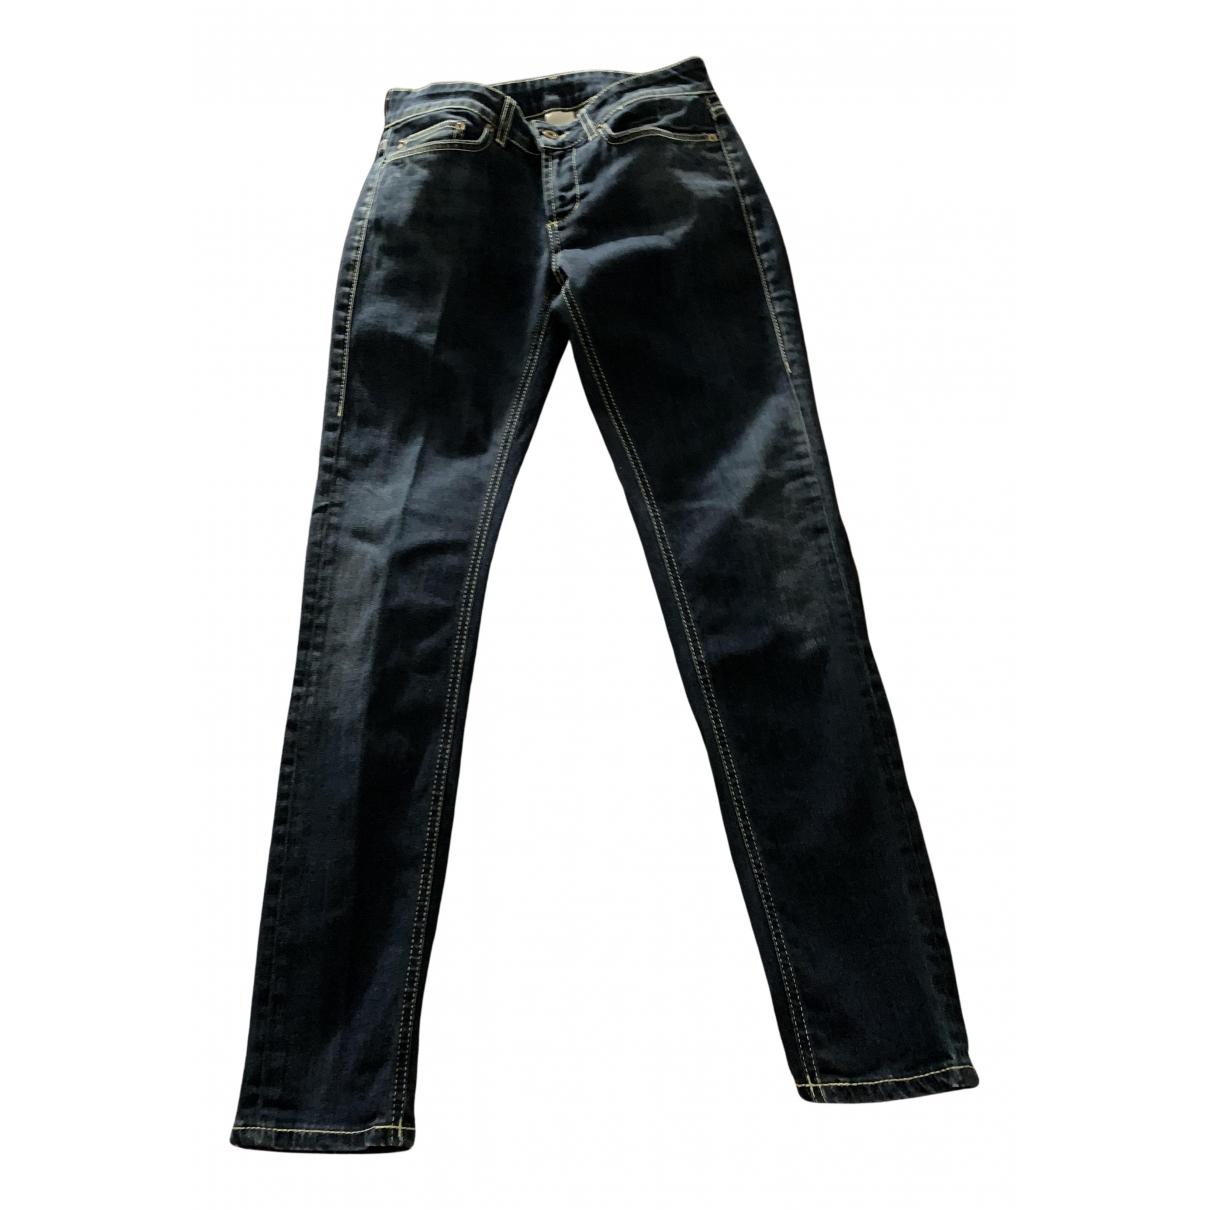 Dondup N Blue Denim - Jeans Jeans for Women 27 US